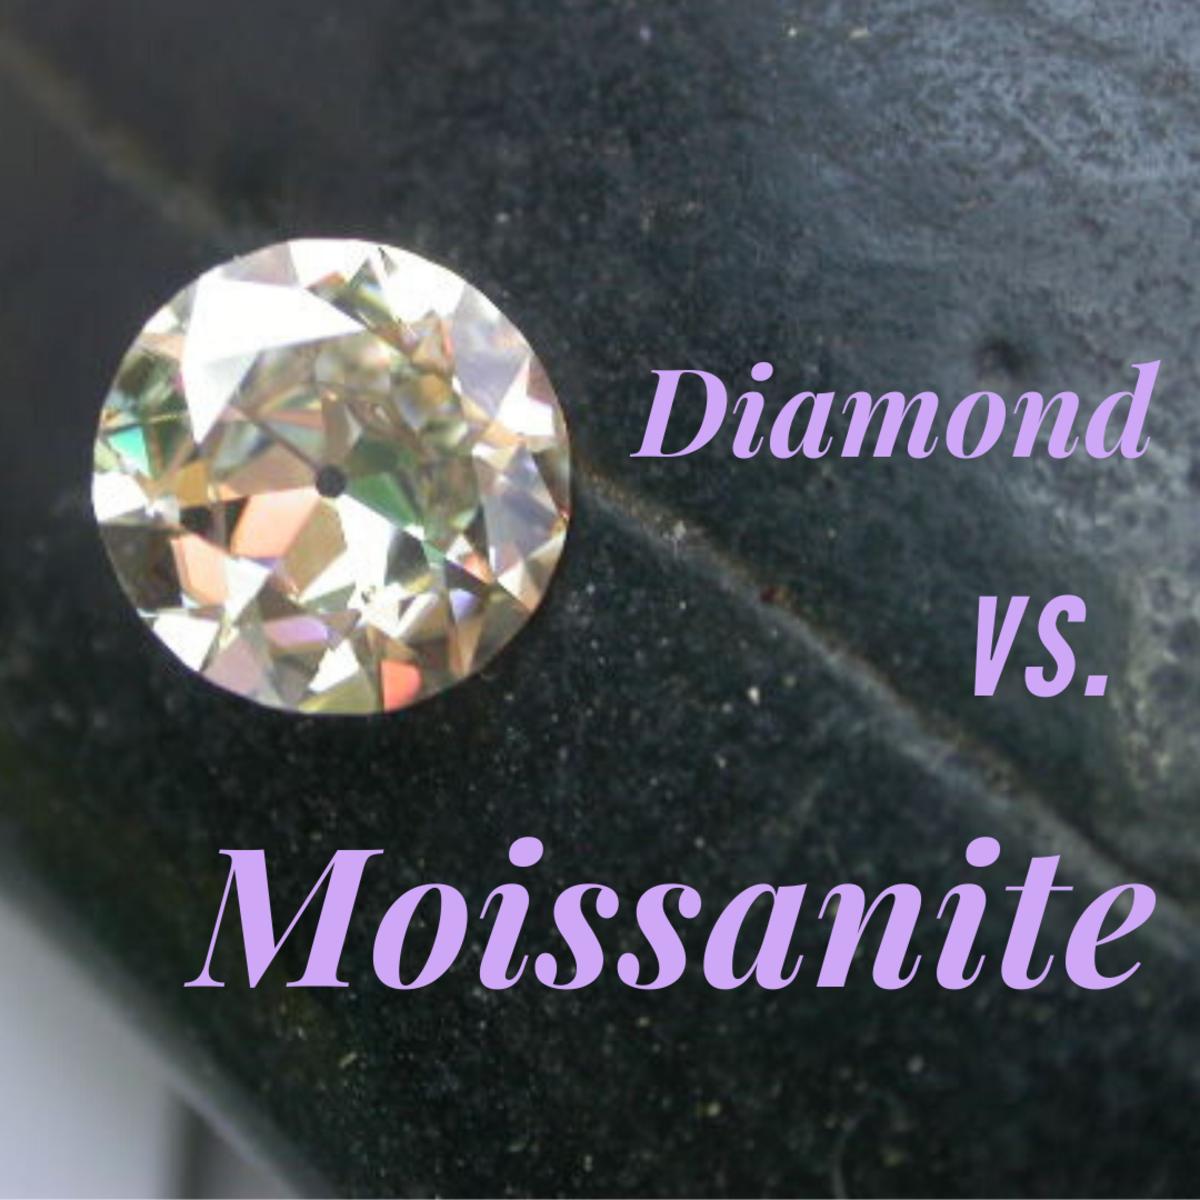 Moissanite vs. Diamond Jewelry